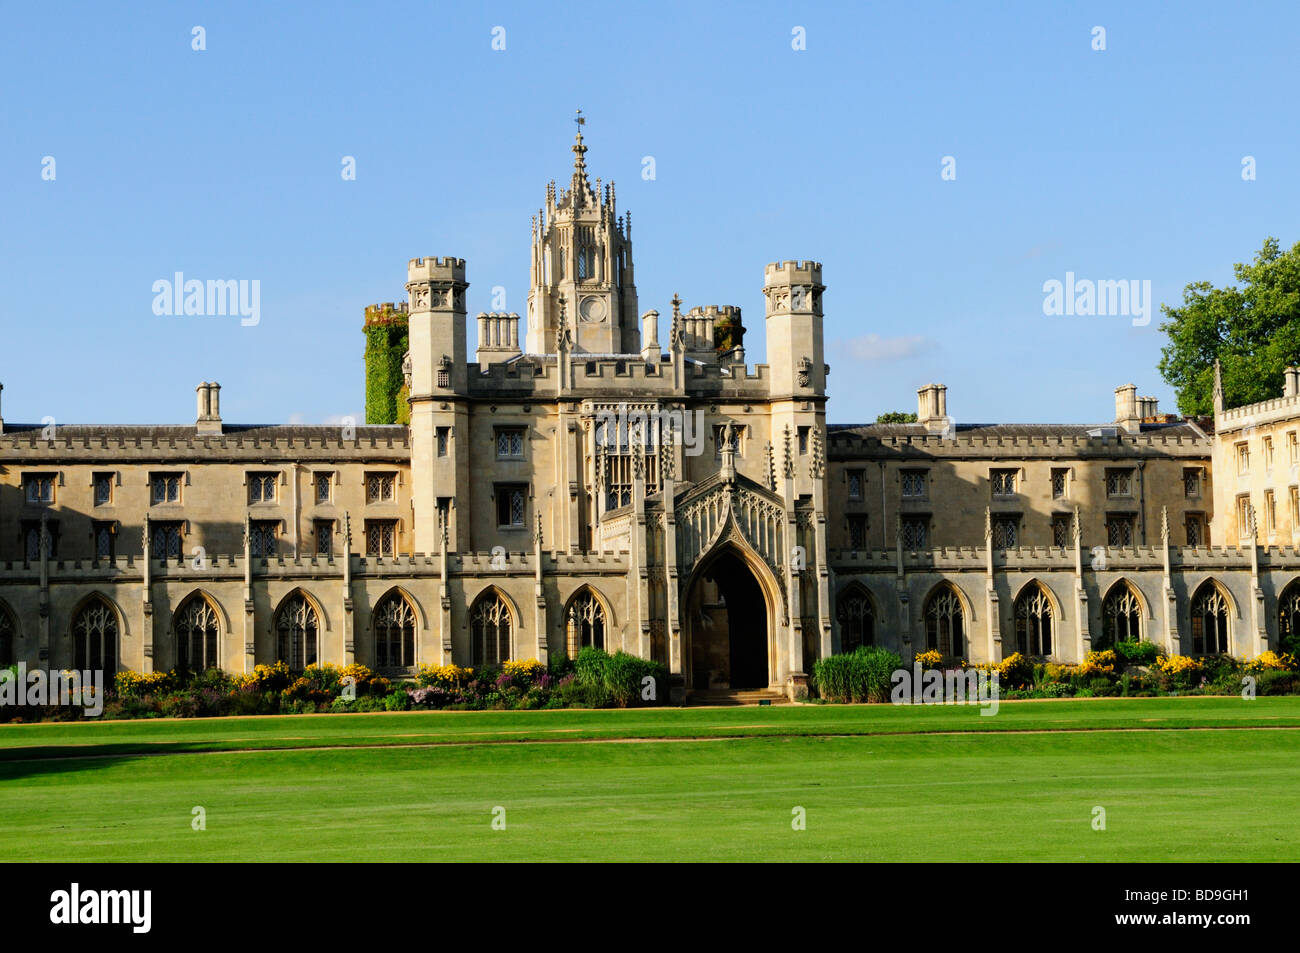 New court at St Johns College Cambridge England UK - Stock Image